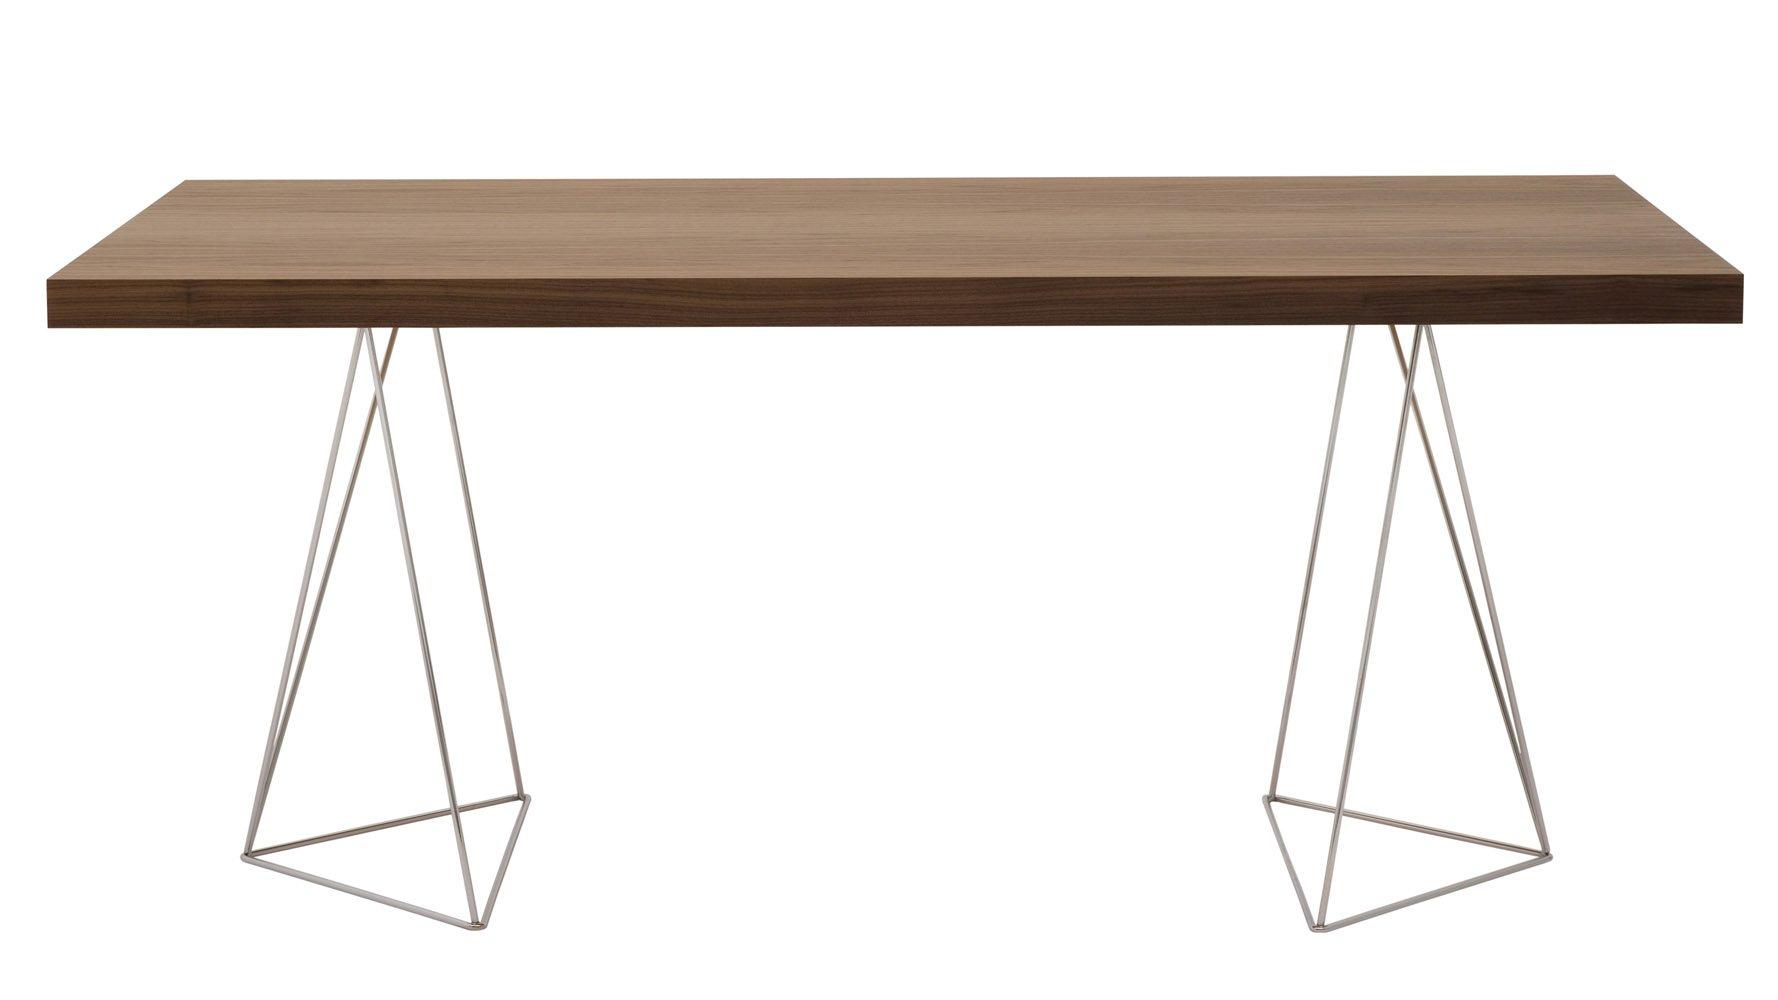 Zahara Table 71quot Zuri Furniture : zahara71 diningtablewithchromelegswalnut 1 from www.zurifurniture.com size 1778 x 1000 jpeg 81kB